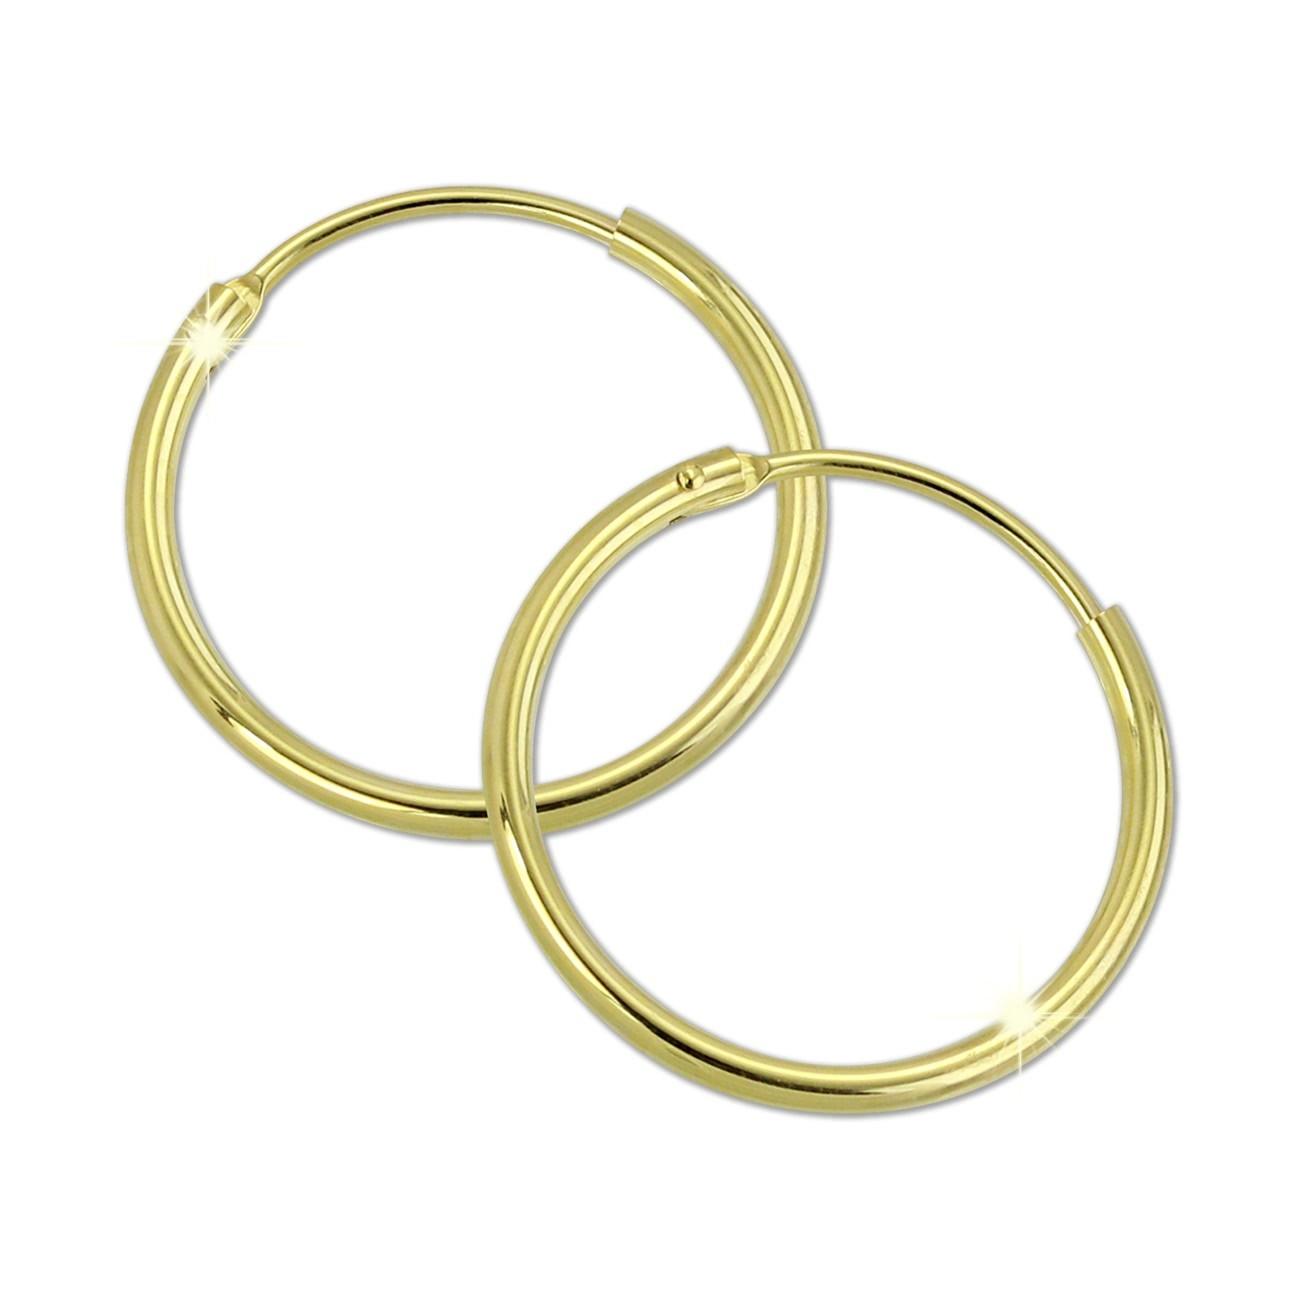 GoldDream Gold Creole 20mm Ohrring 333er Gelbgold Echtschmuck GDO0031Y